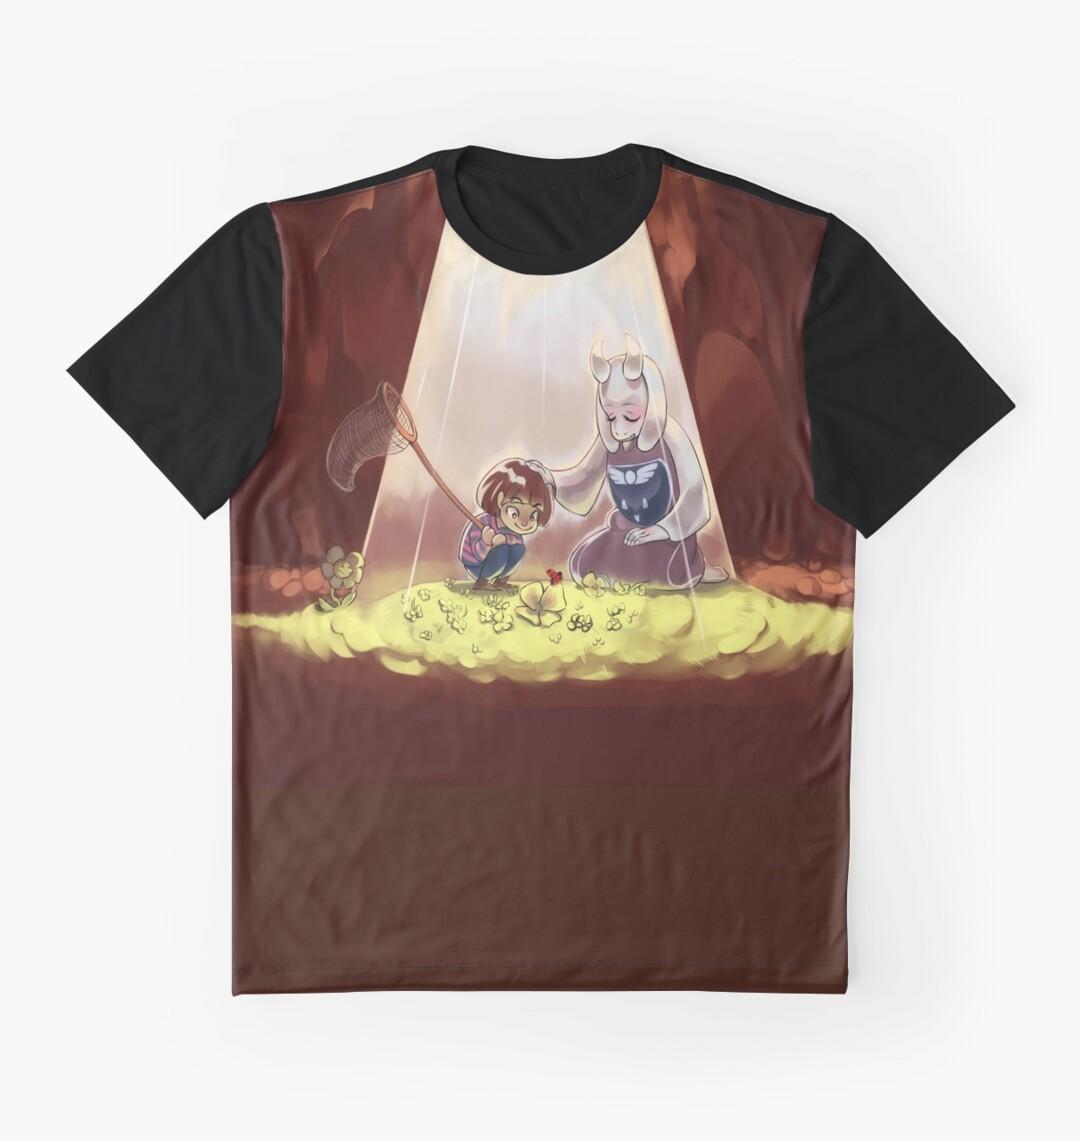 Design shirt redbubble - Cute Undertale Design